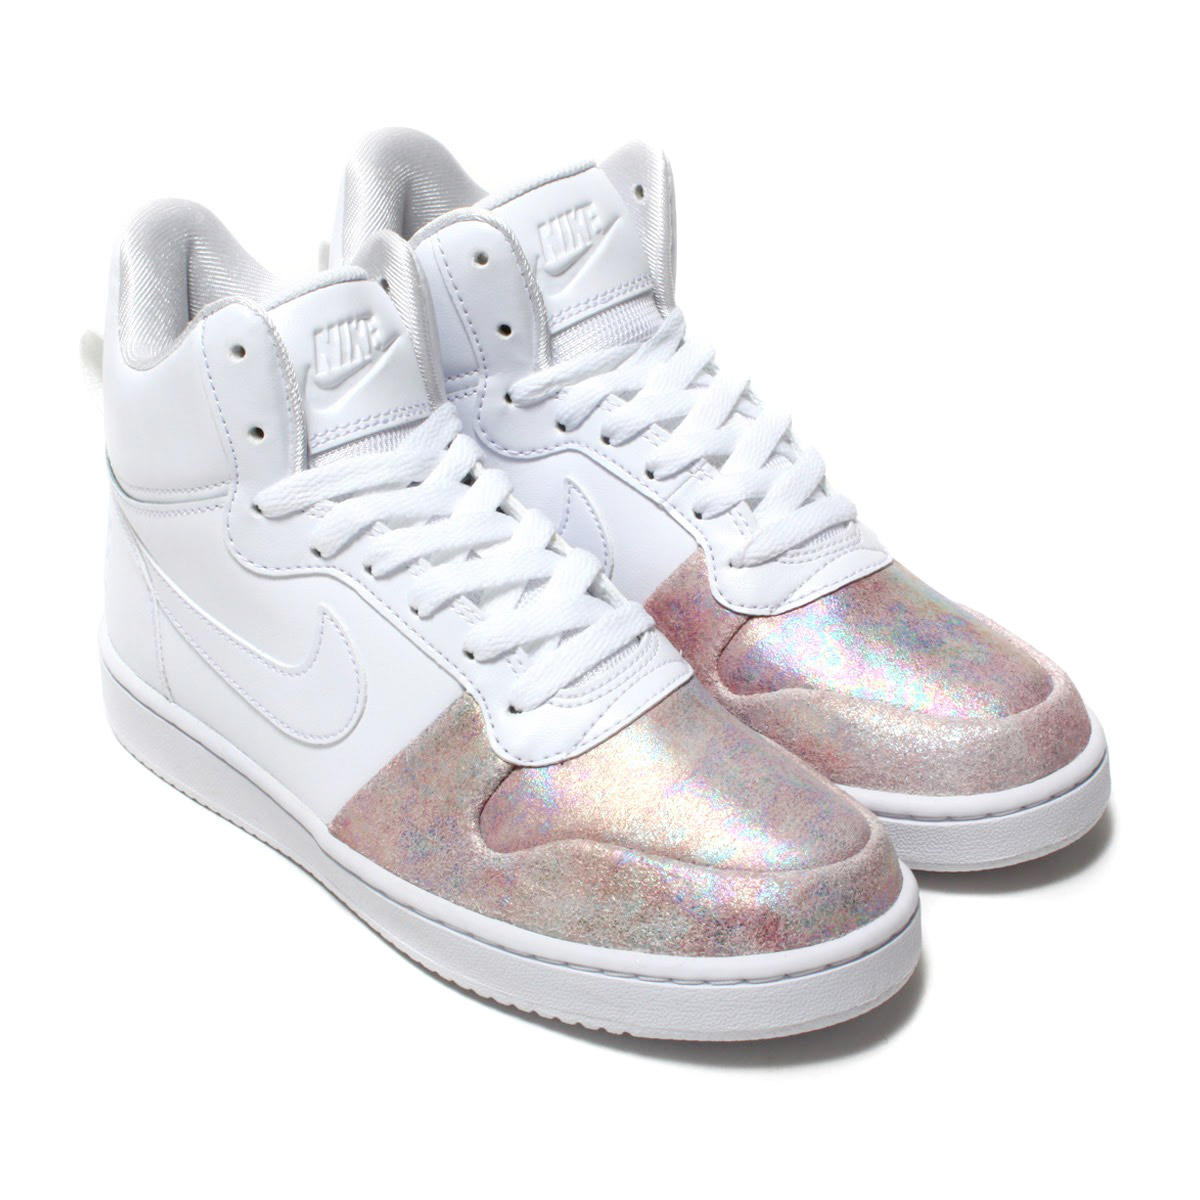 f9570d6234f8 atmos pink  NIKE W COURT BOROUGH MID PREM (Nike women coat Barlow ...